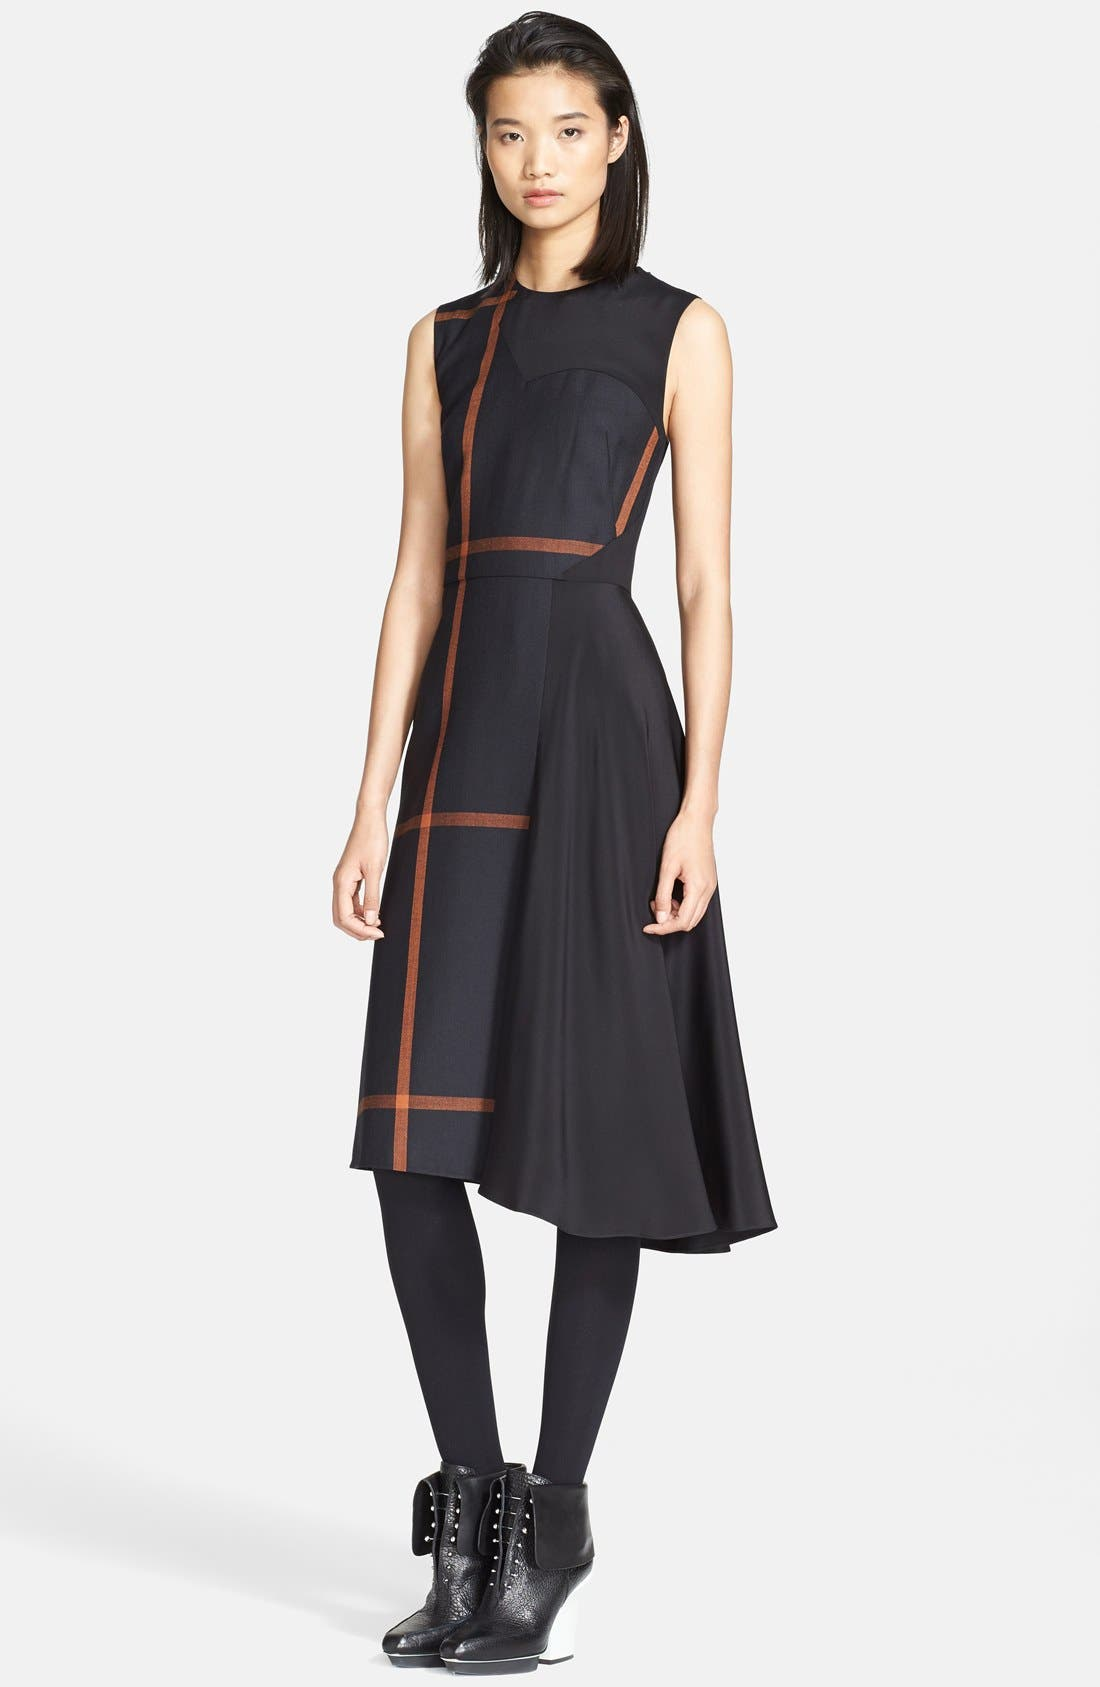 Main Image - 3.1 Phillip Lim 'Shadow' Satin Inset Dress